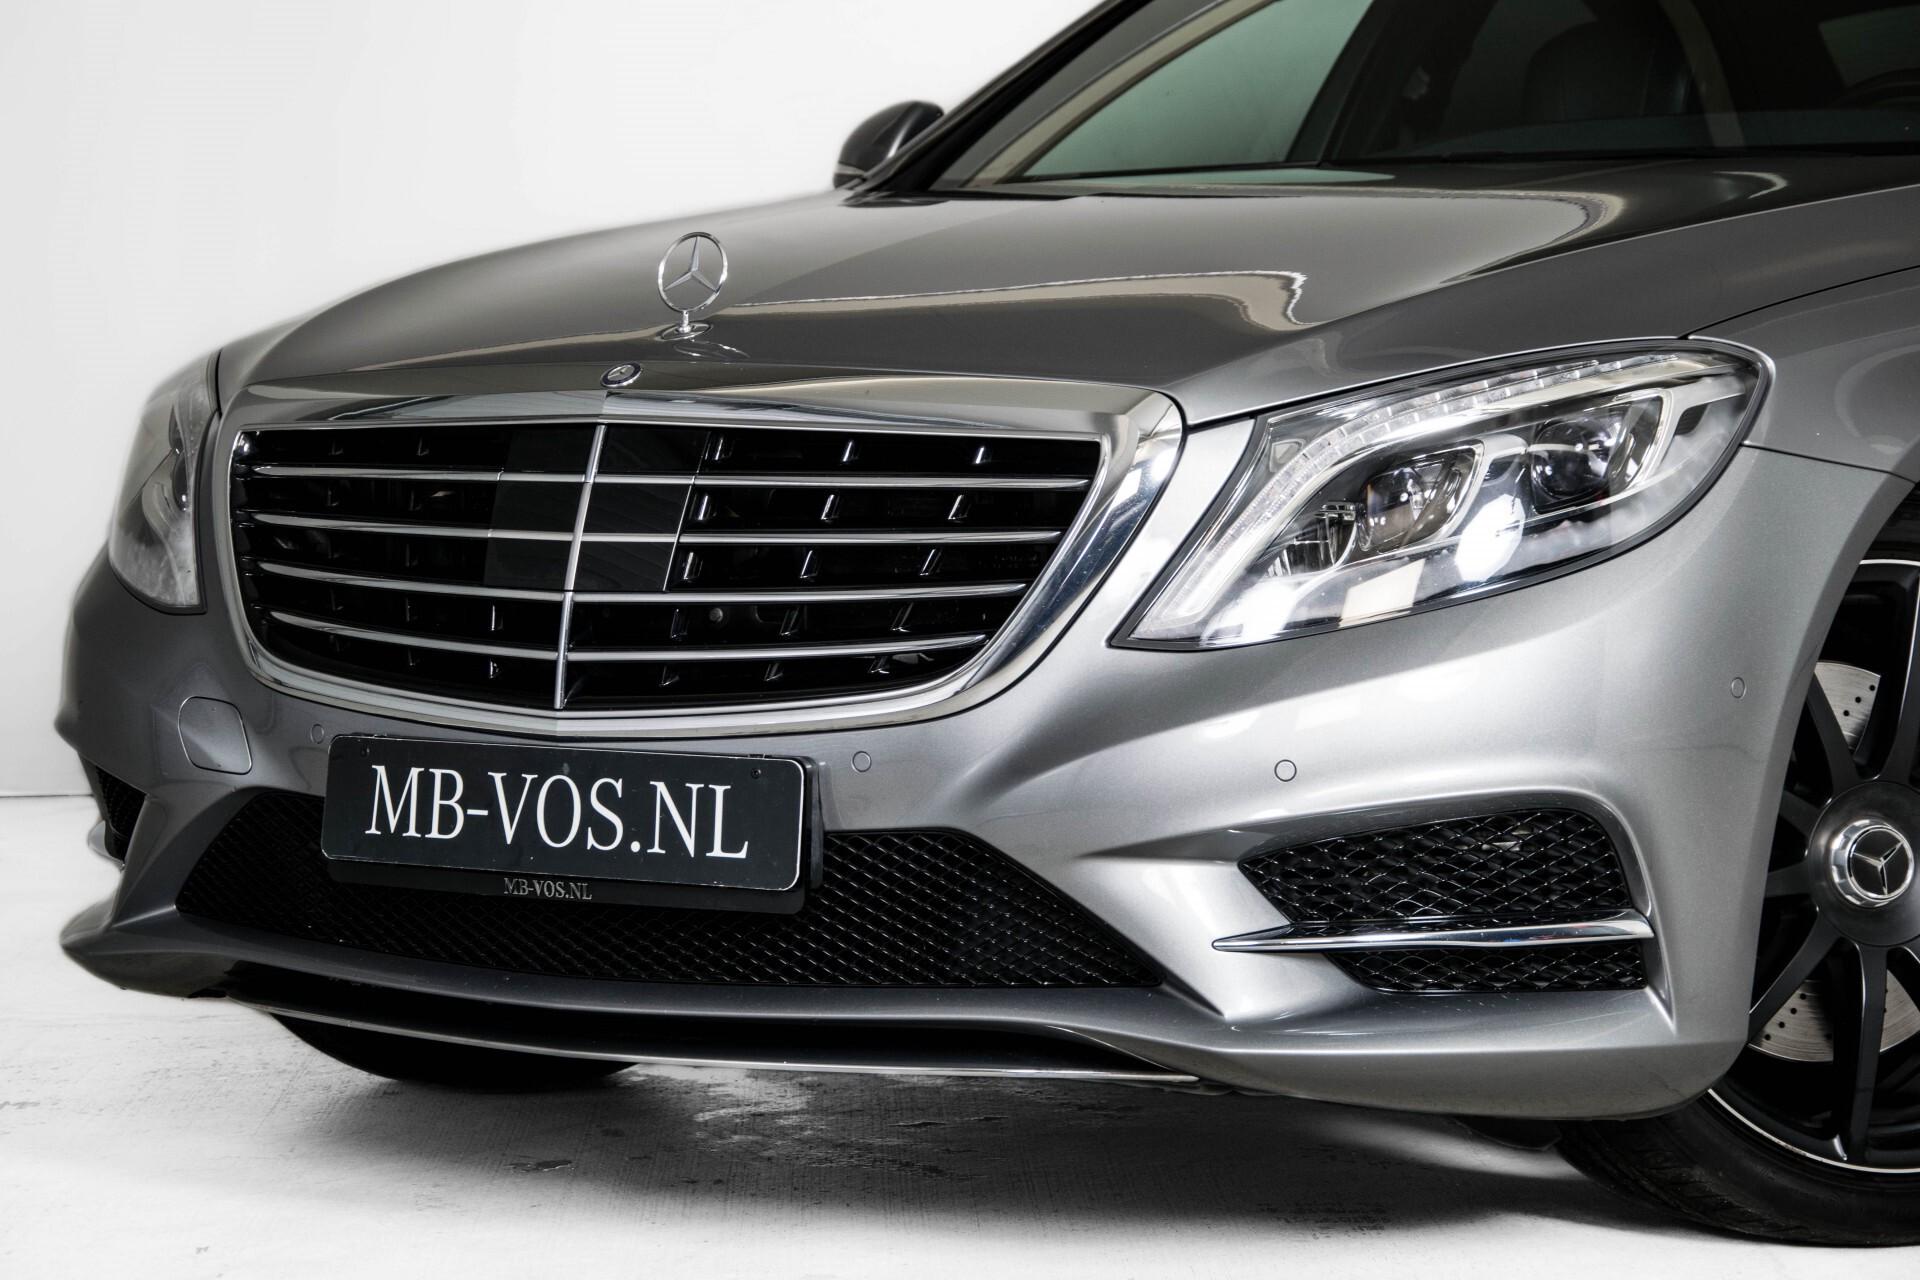 Mercedes-Benz S-Klasse 350 BlueTEC 63 AMG Panorama/Distronic/Keyless/Massage/Burmester Aut7 Foto 40